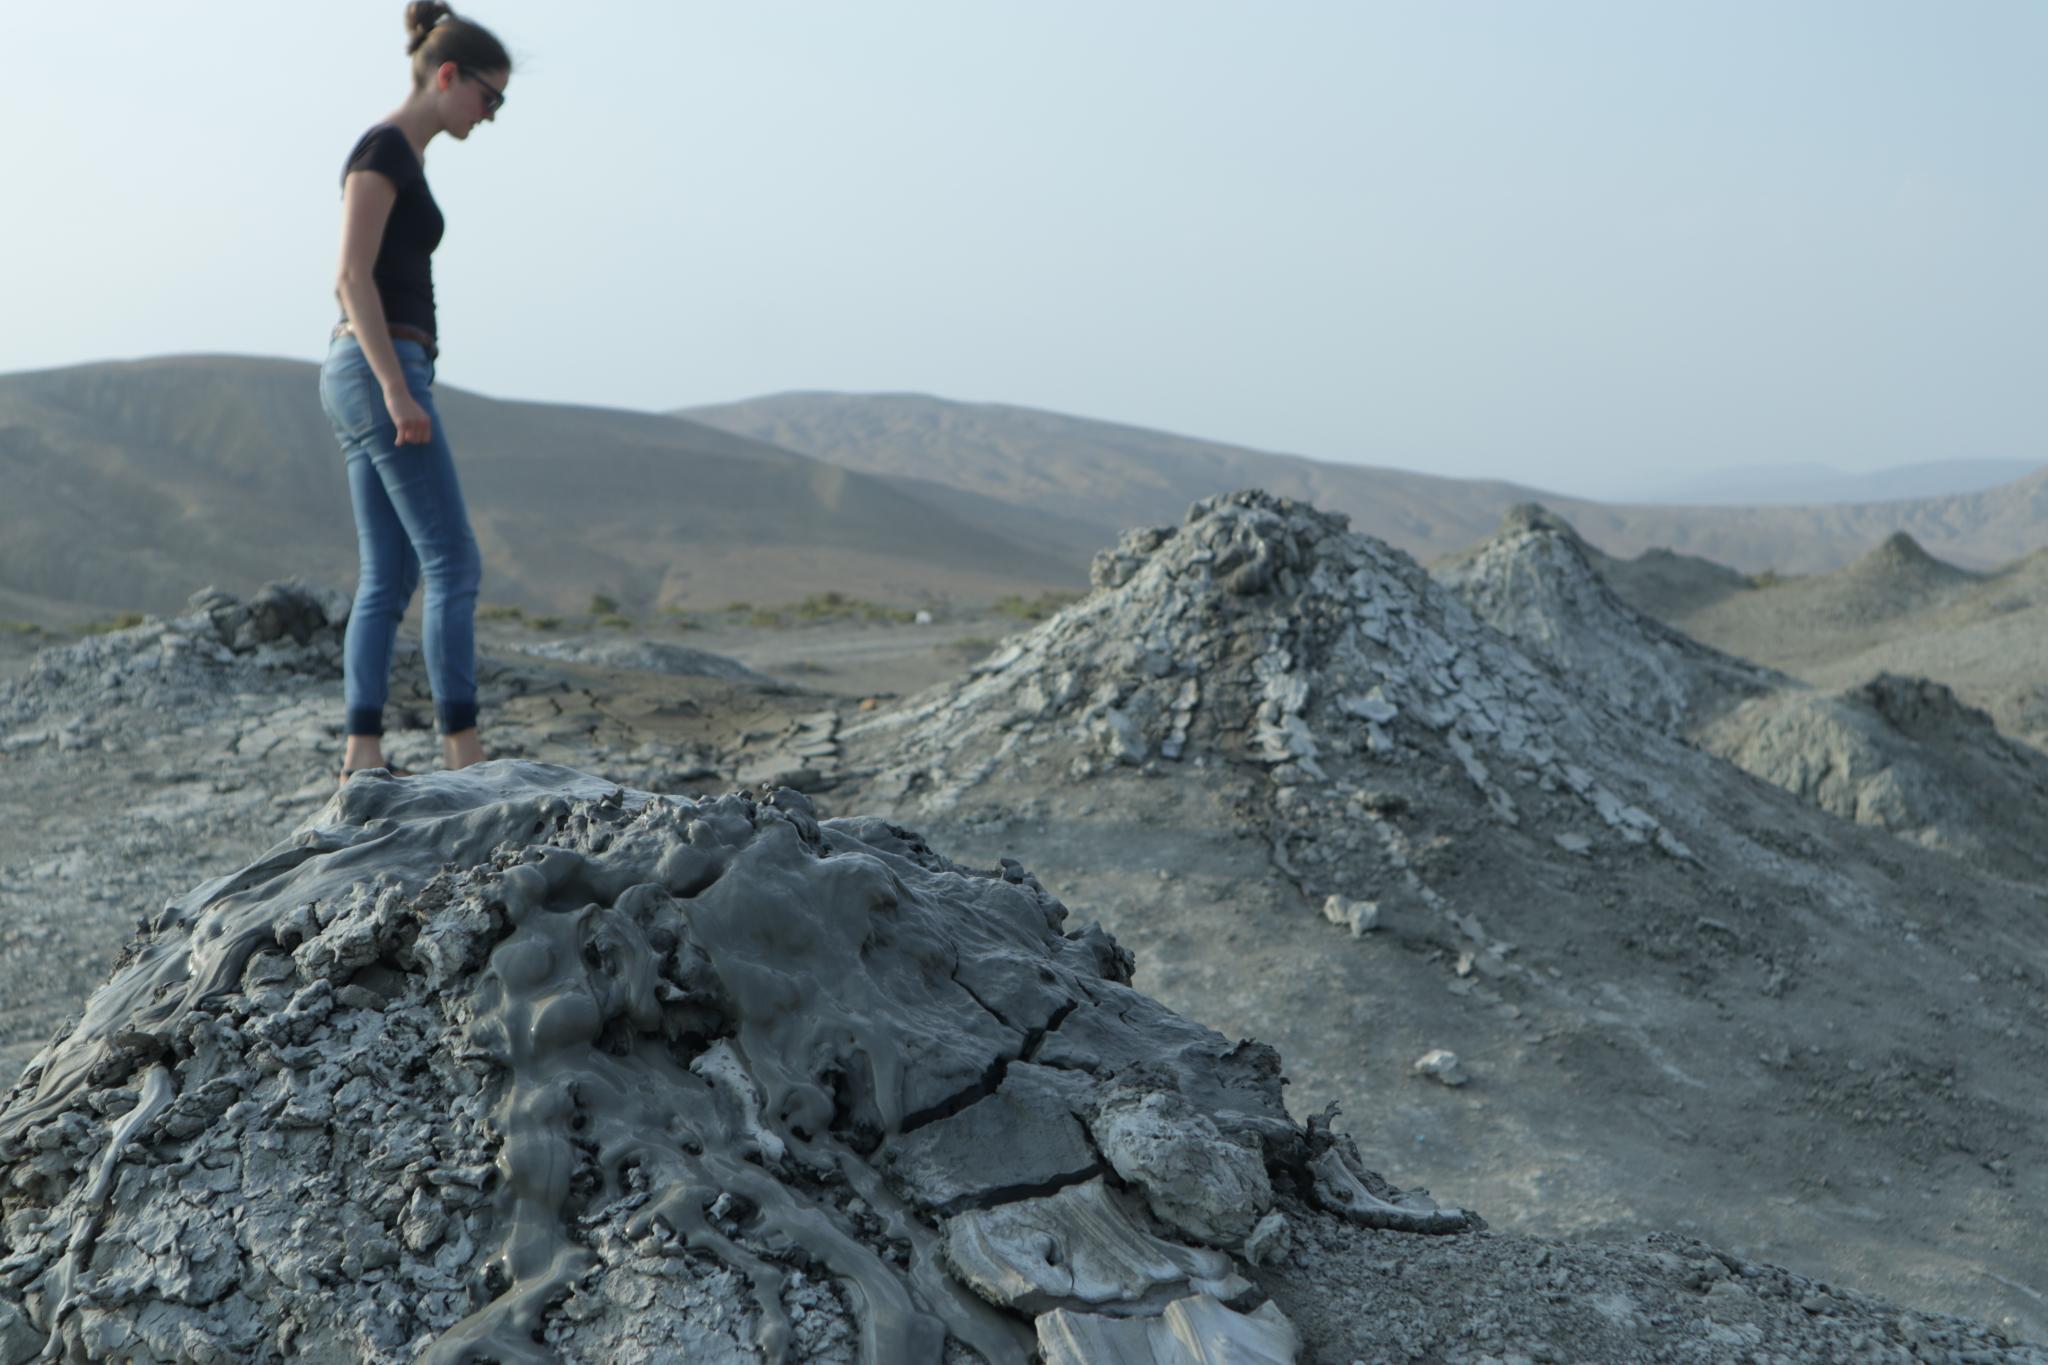 Bahenné sopky v Qobustan, Azerbajdžan